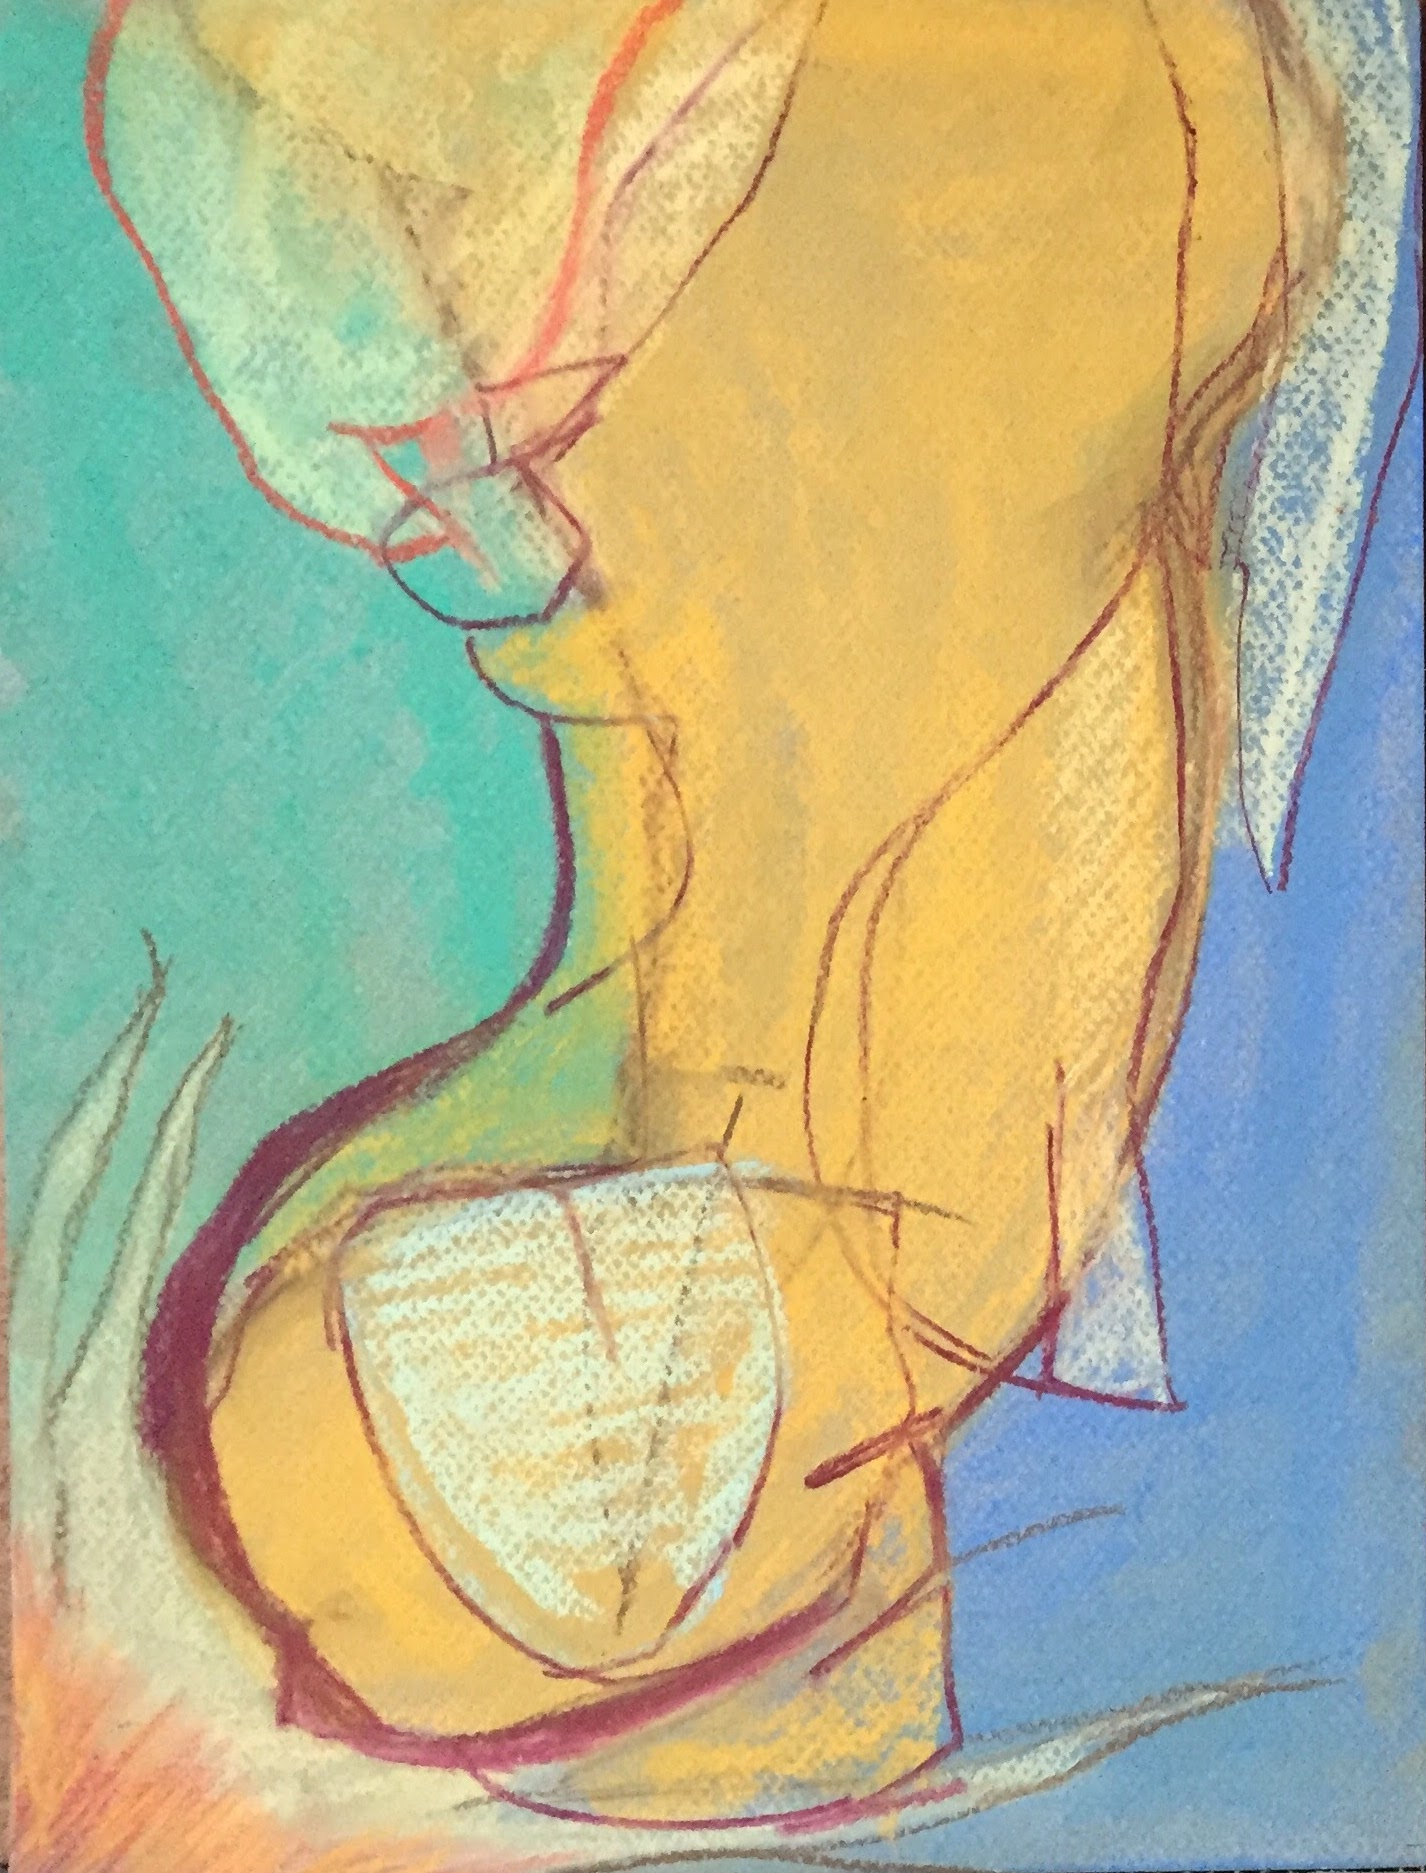 Anima 9 x 12 | Pastel on paper